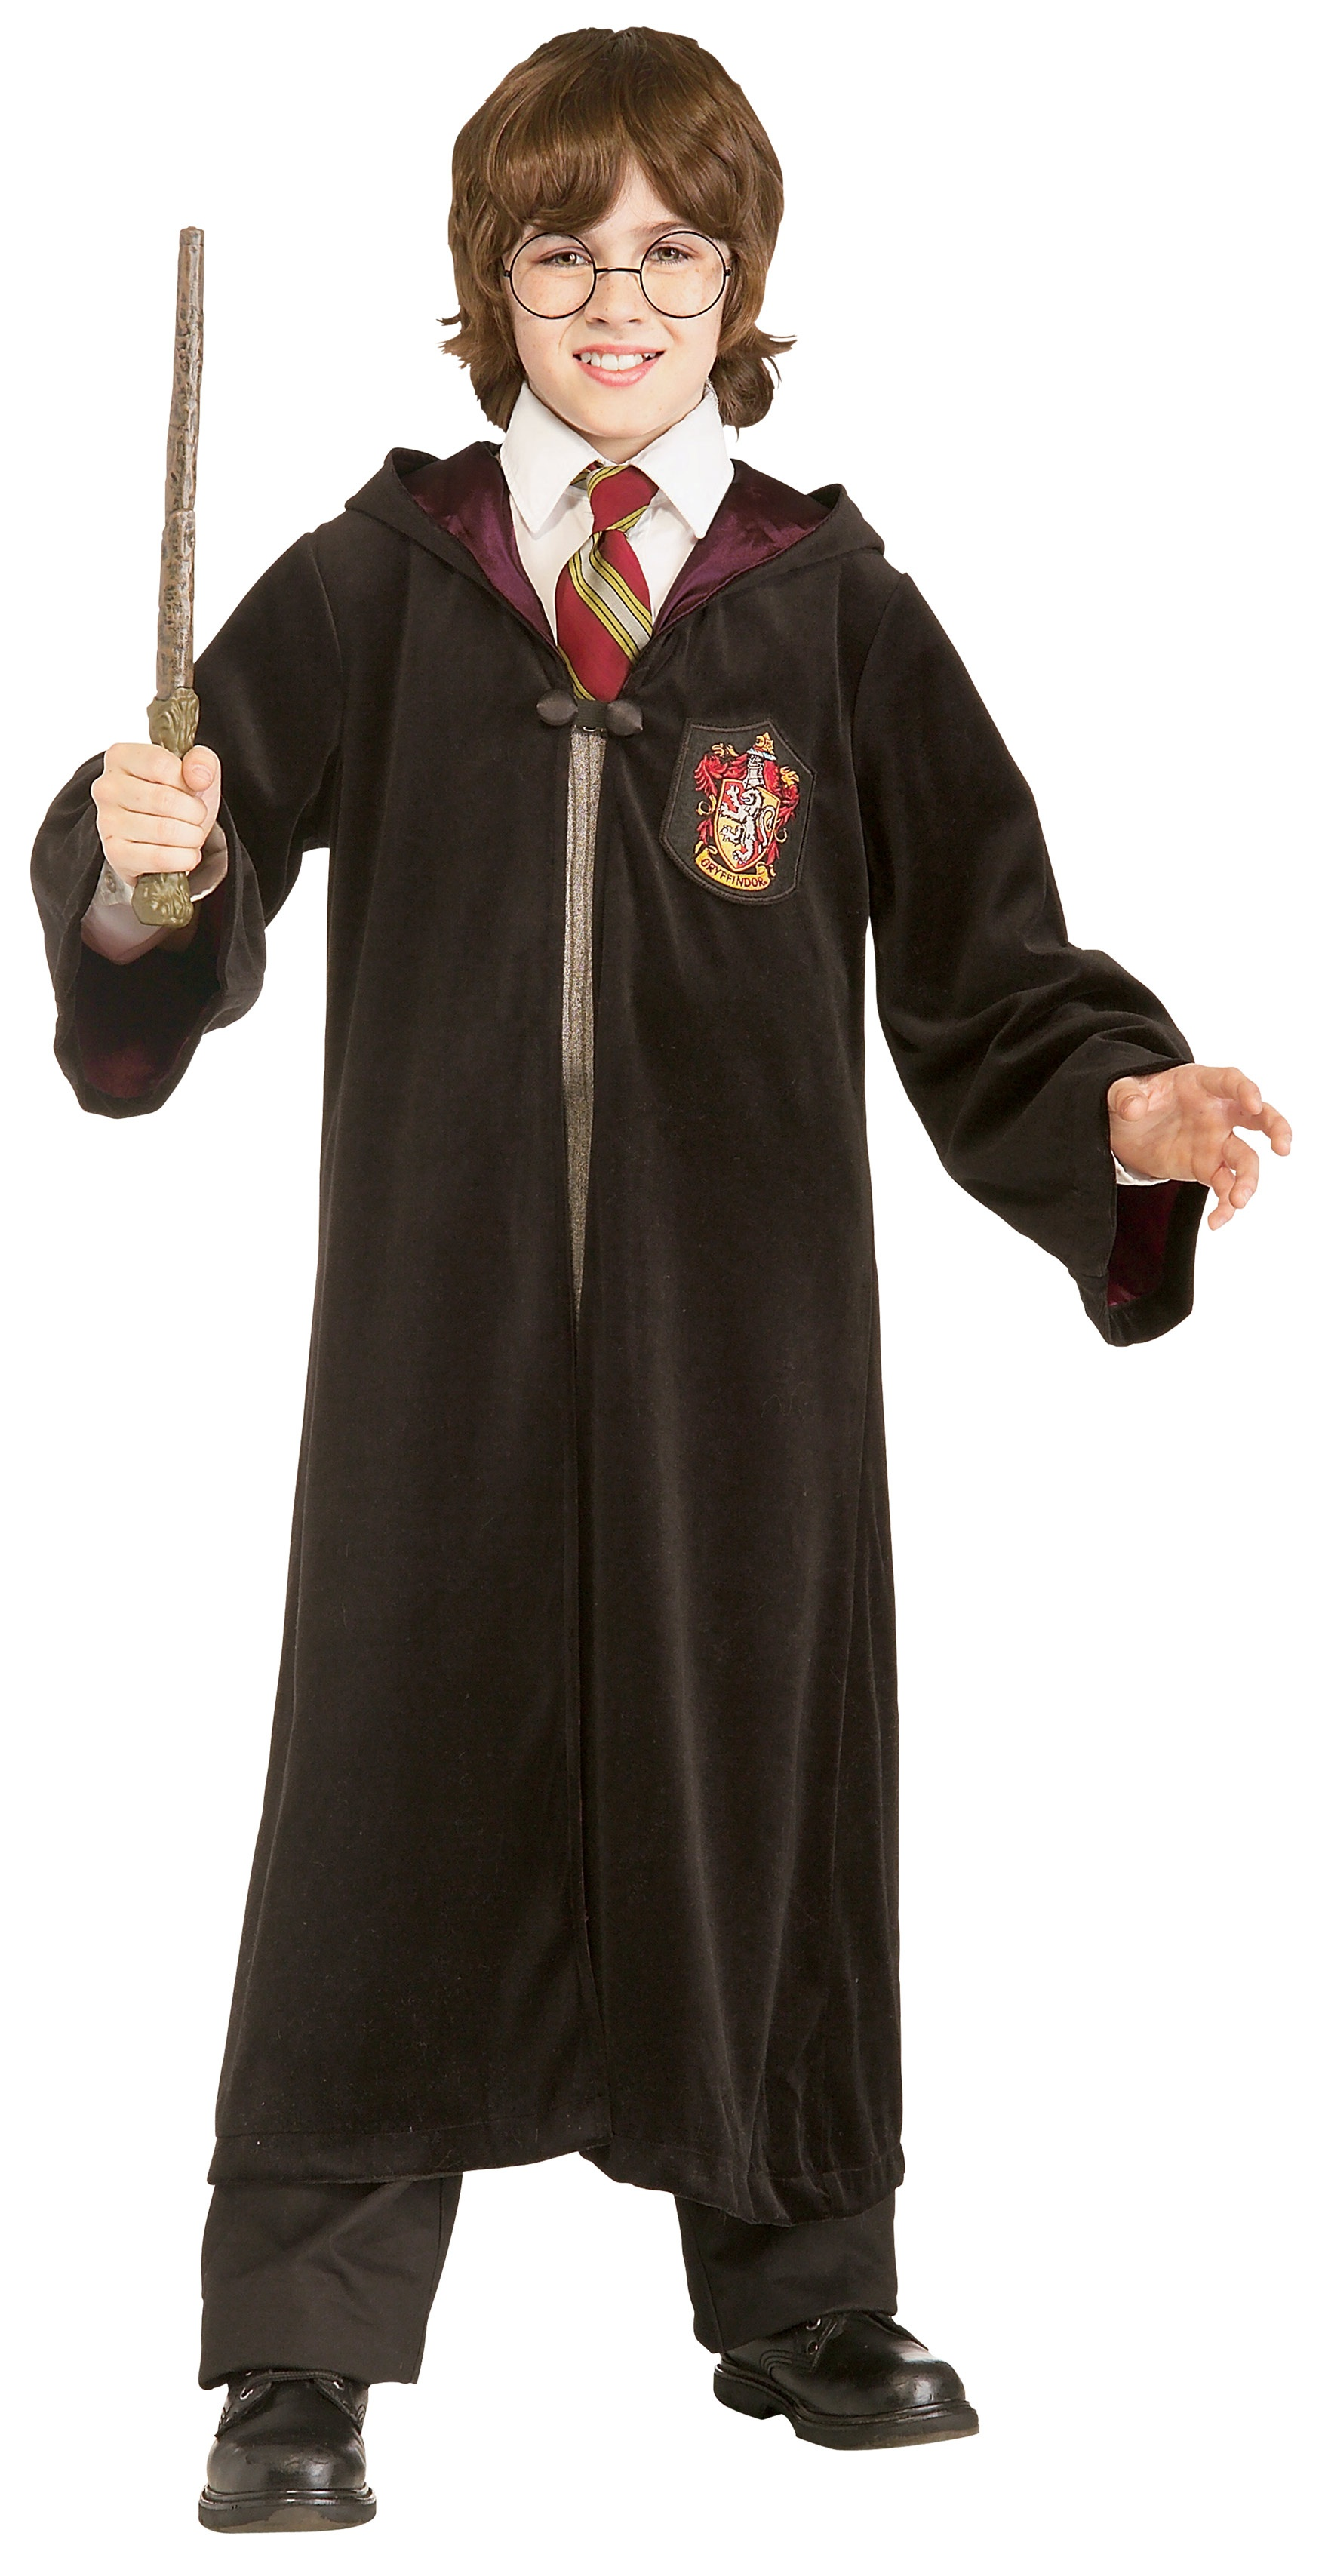 Harry Potter Gryffindor Robe Adult Costume. Harry Potter Costumes